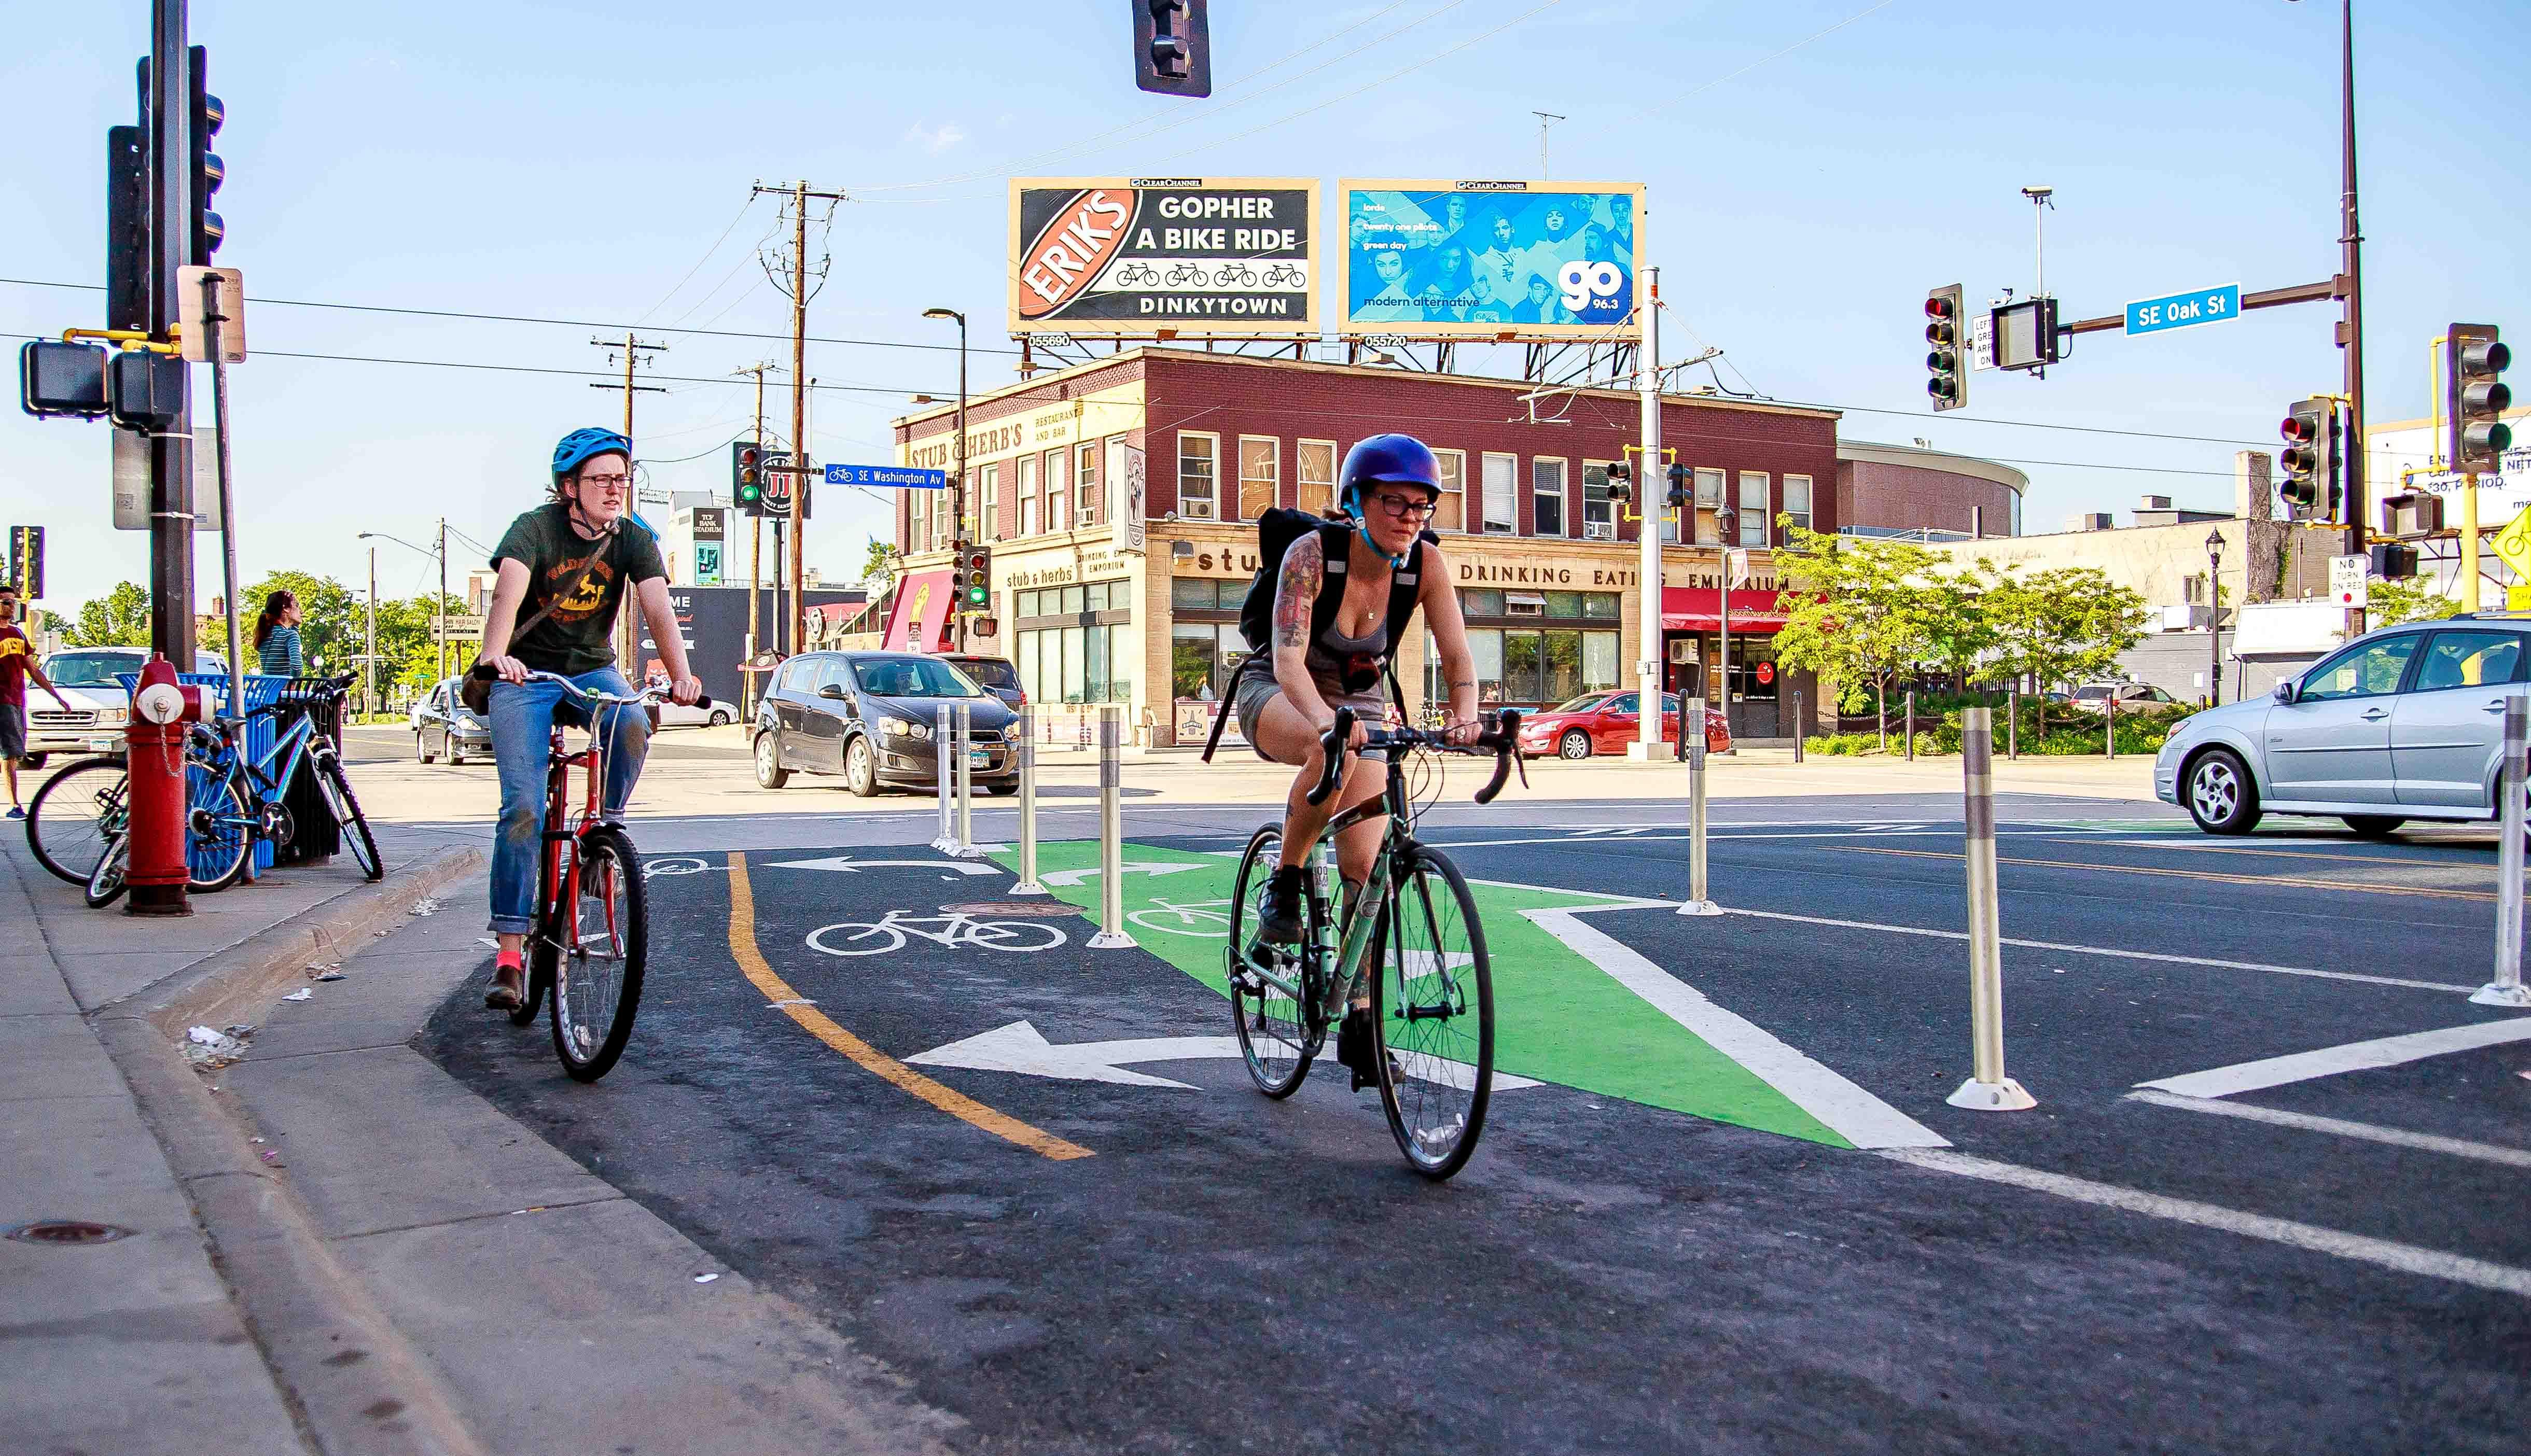 Two people in bike lane